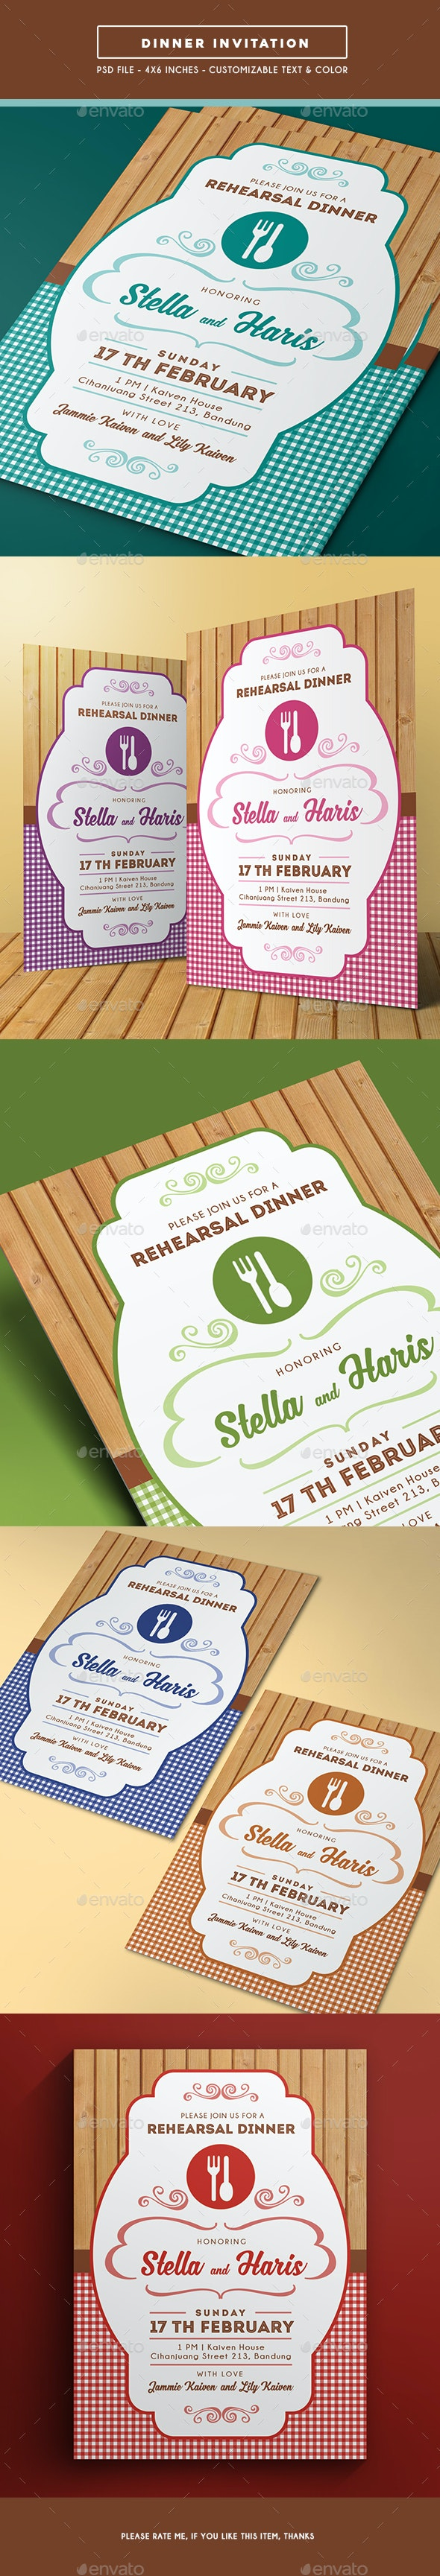 Dinner Invitation - Invitations Cards & Invites